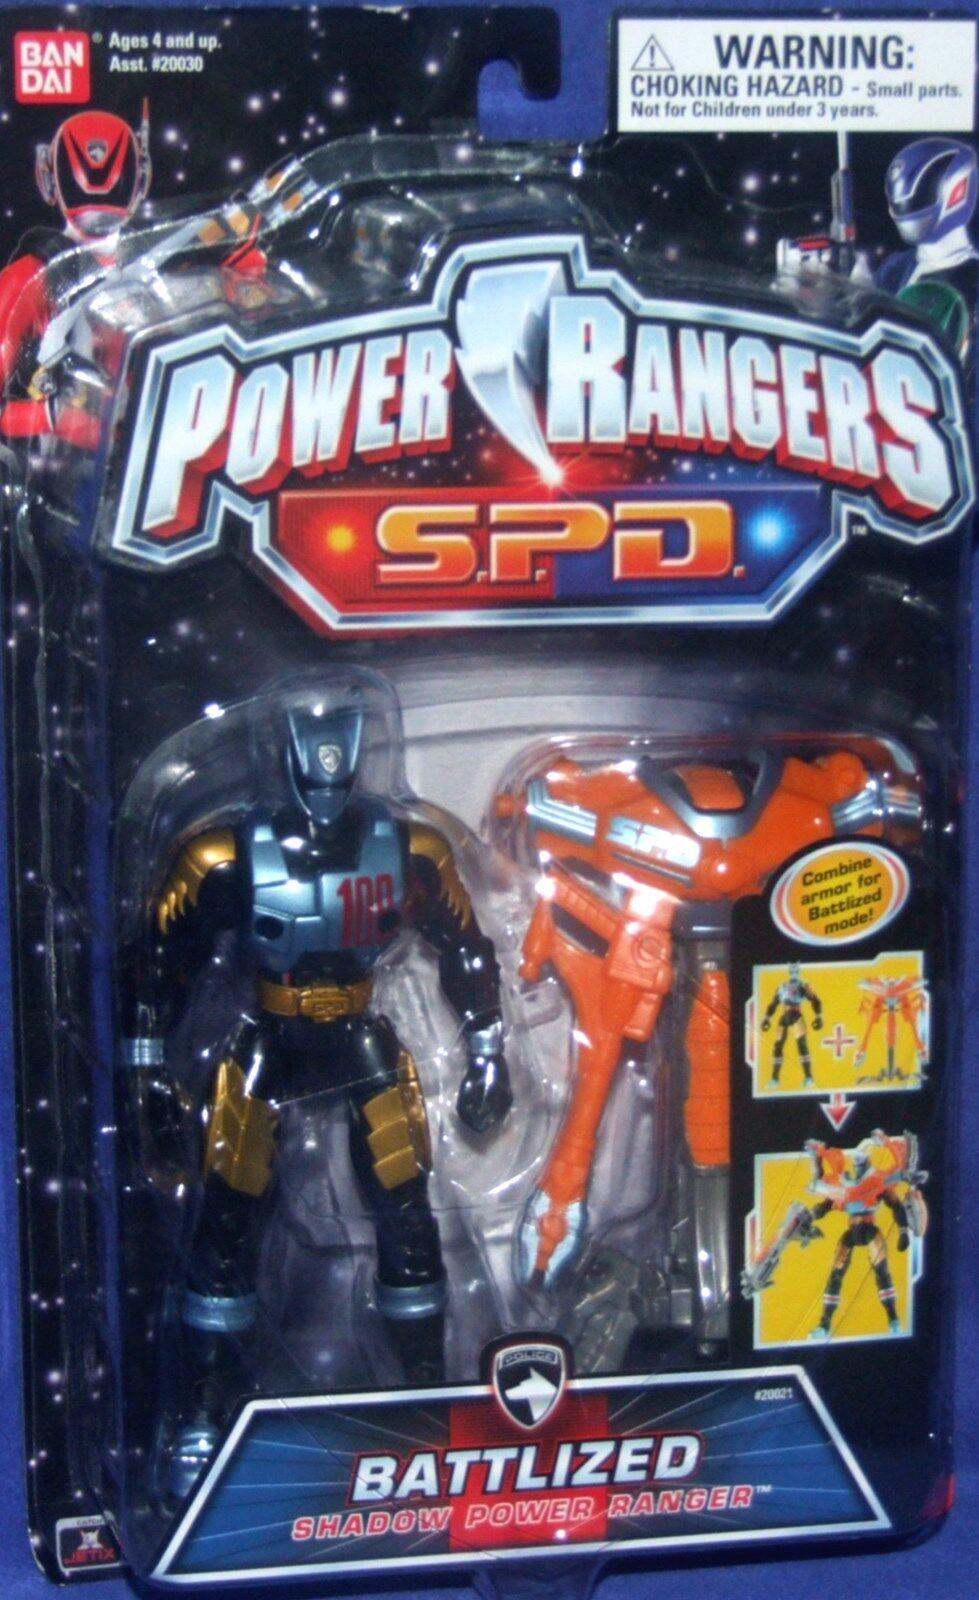 Power Rangers 6  SPD SHADOW BATTLIZED Power Ranger Nuovo Factory Sealed 2005